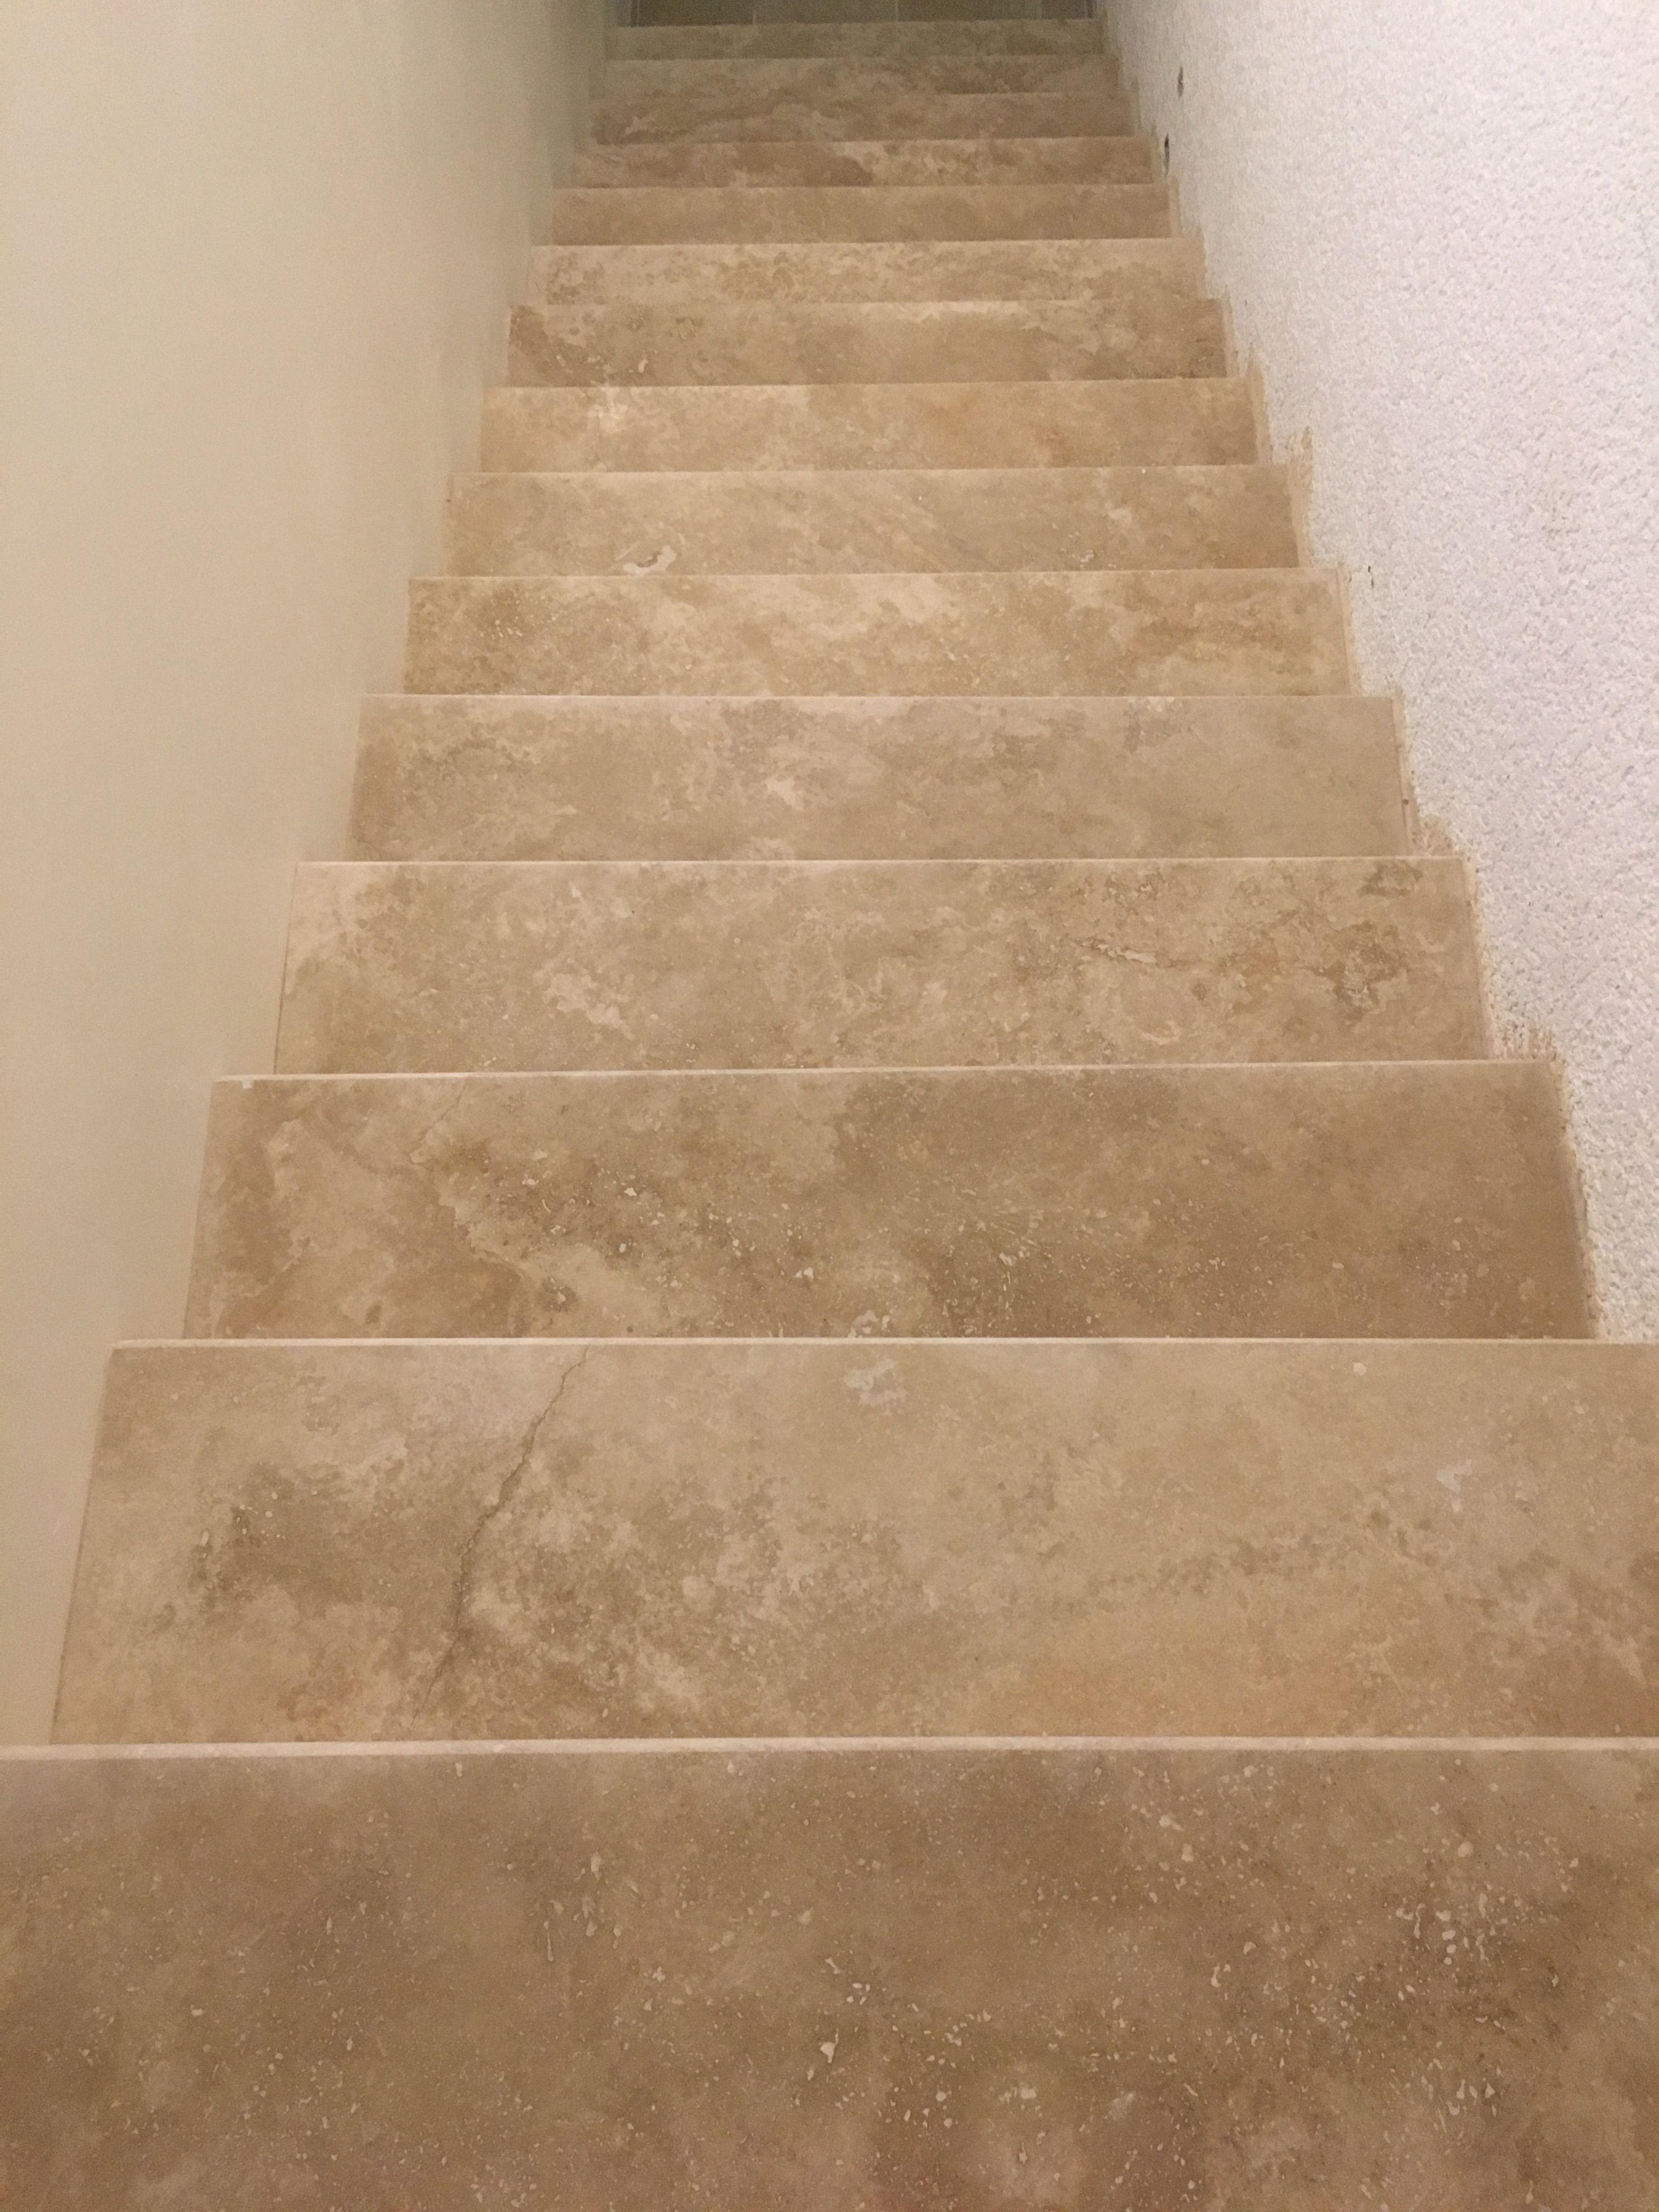 Travertin Escalier Marche En 3cm Bord Arrondi Escalier Escalier Carrelage Carrelage Travertin